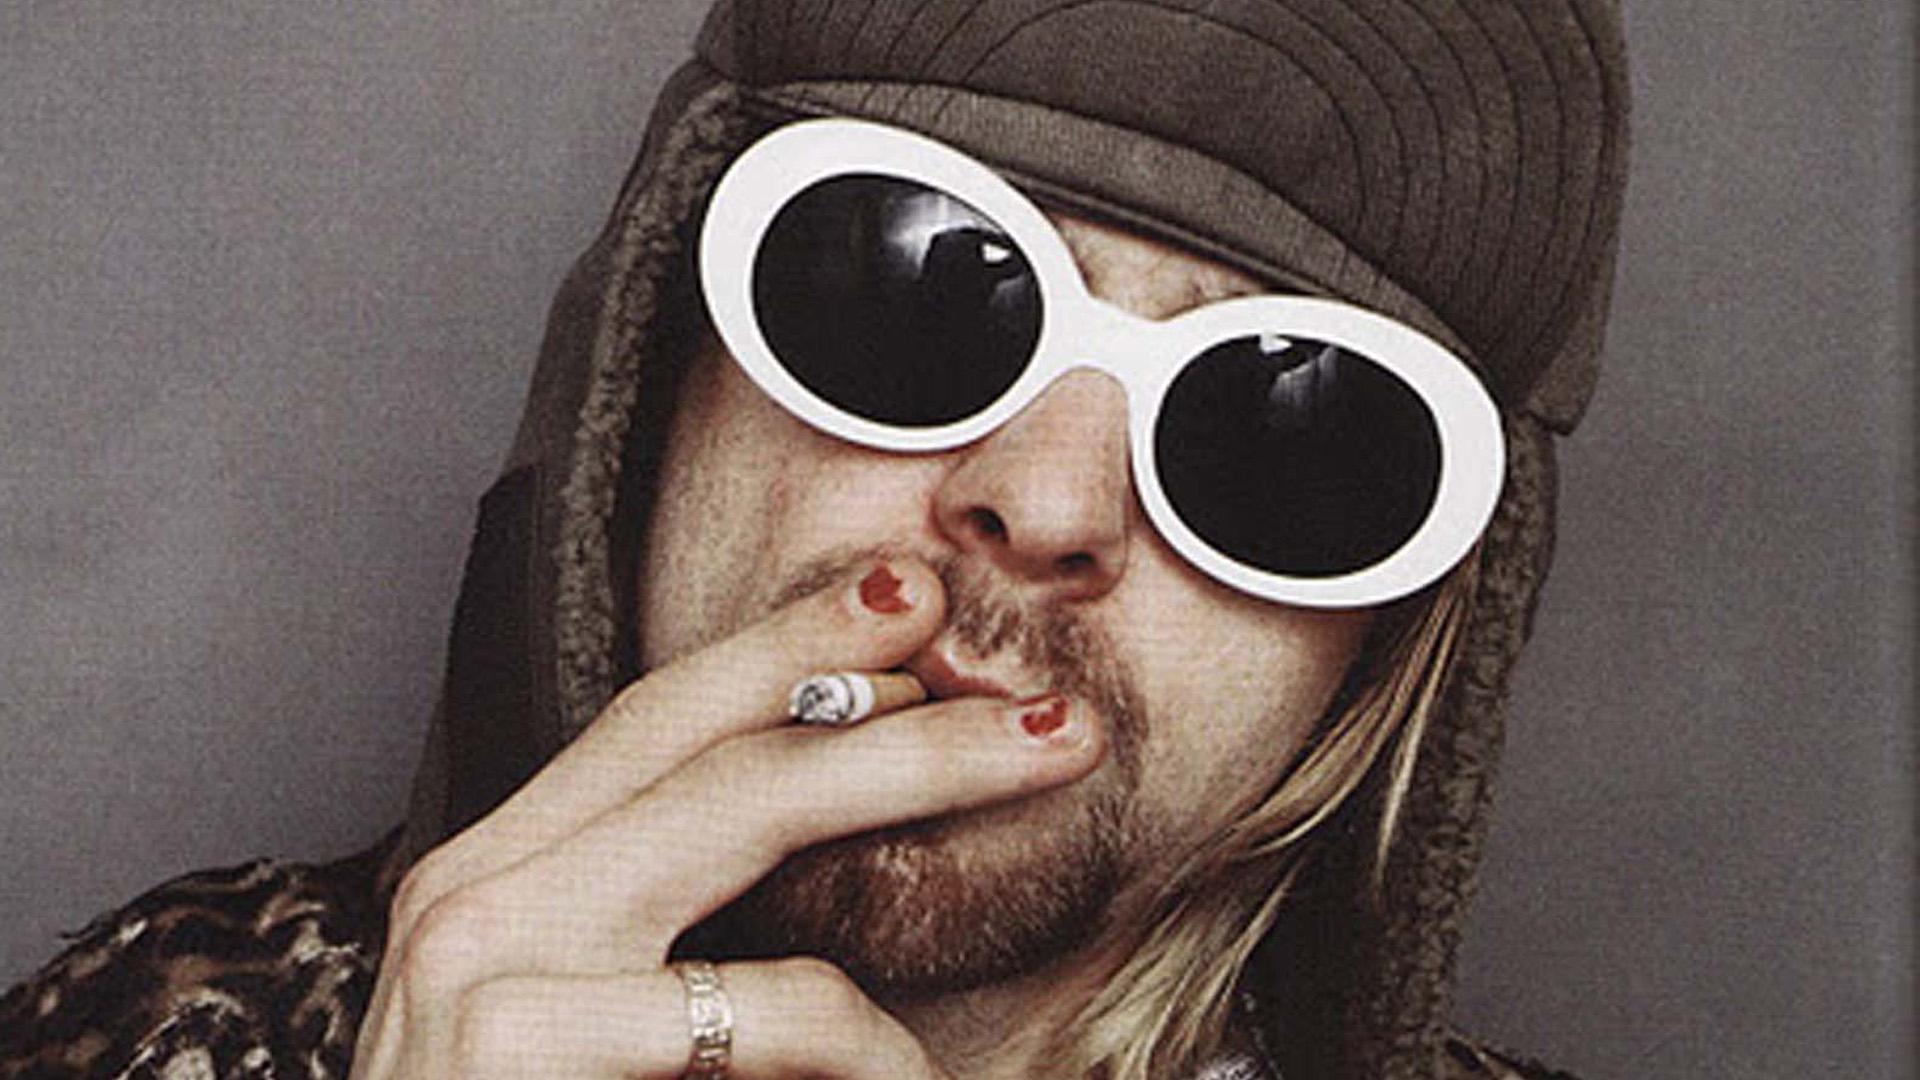 HD Kurt Cobain Wallpapers HdCoolWallpapersCom 1920x1080